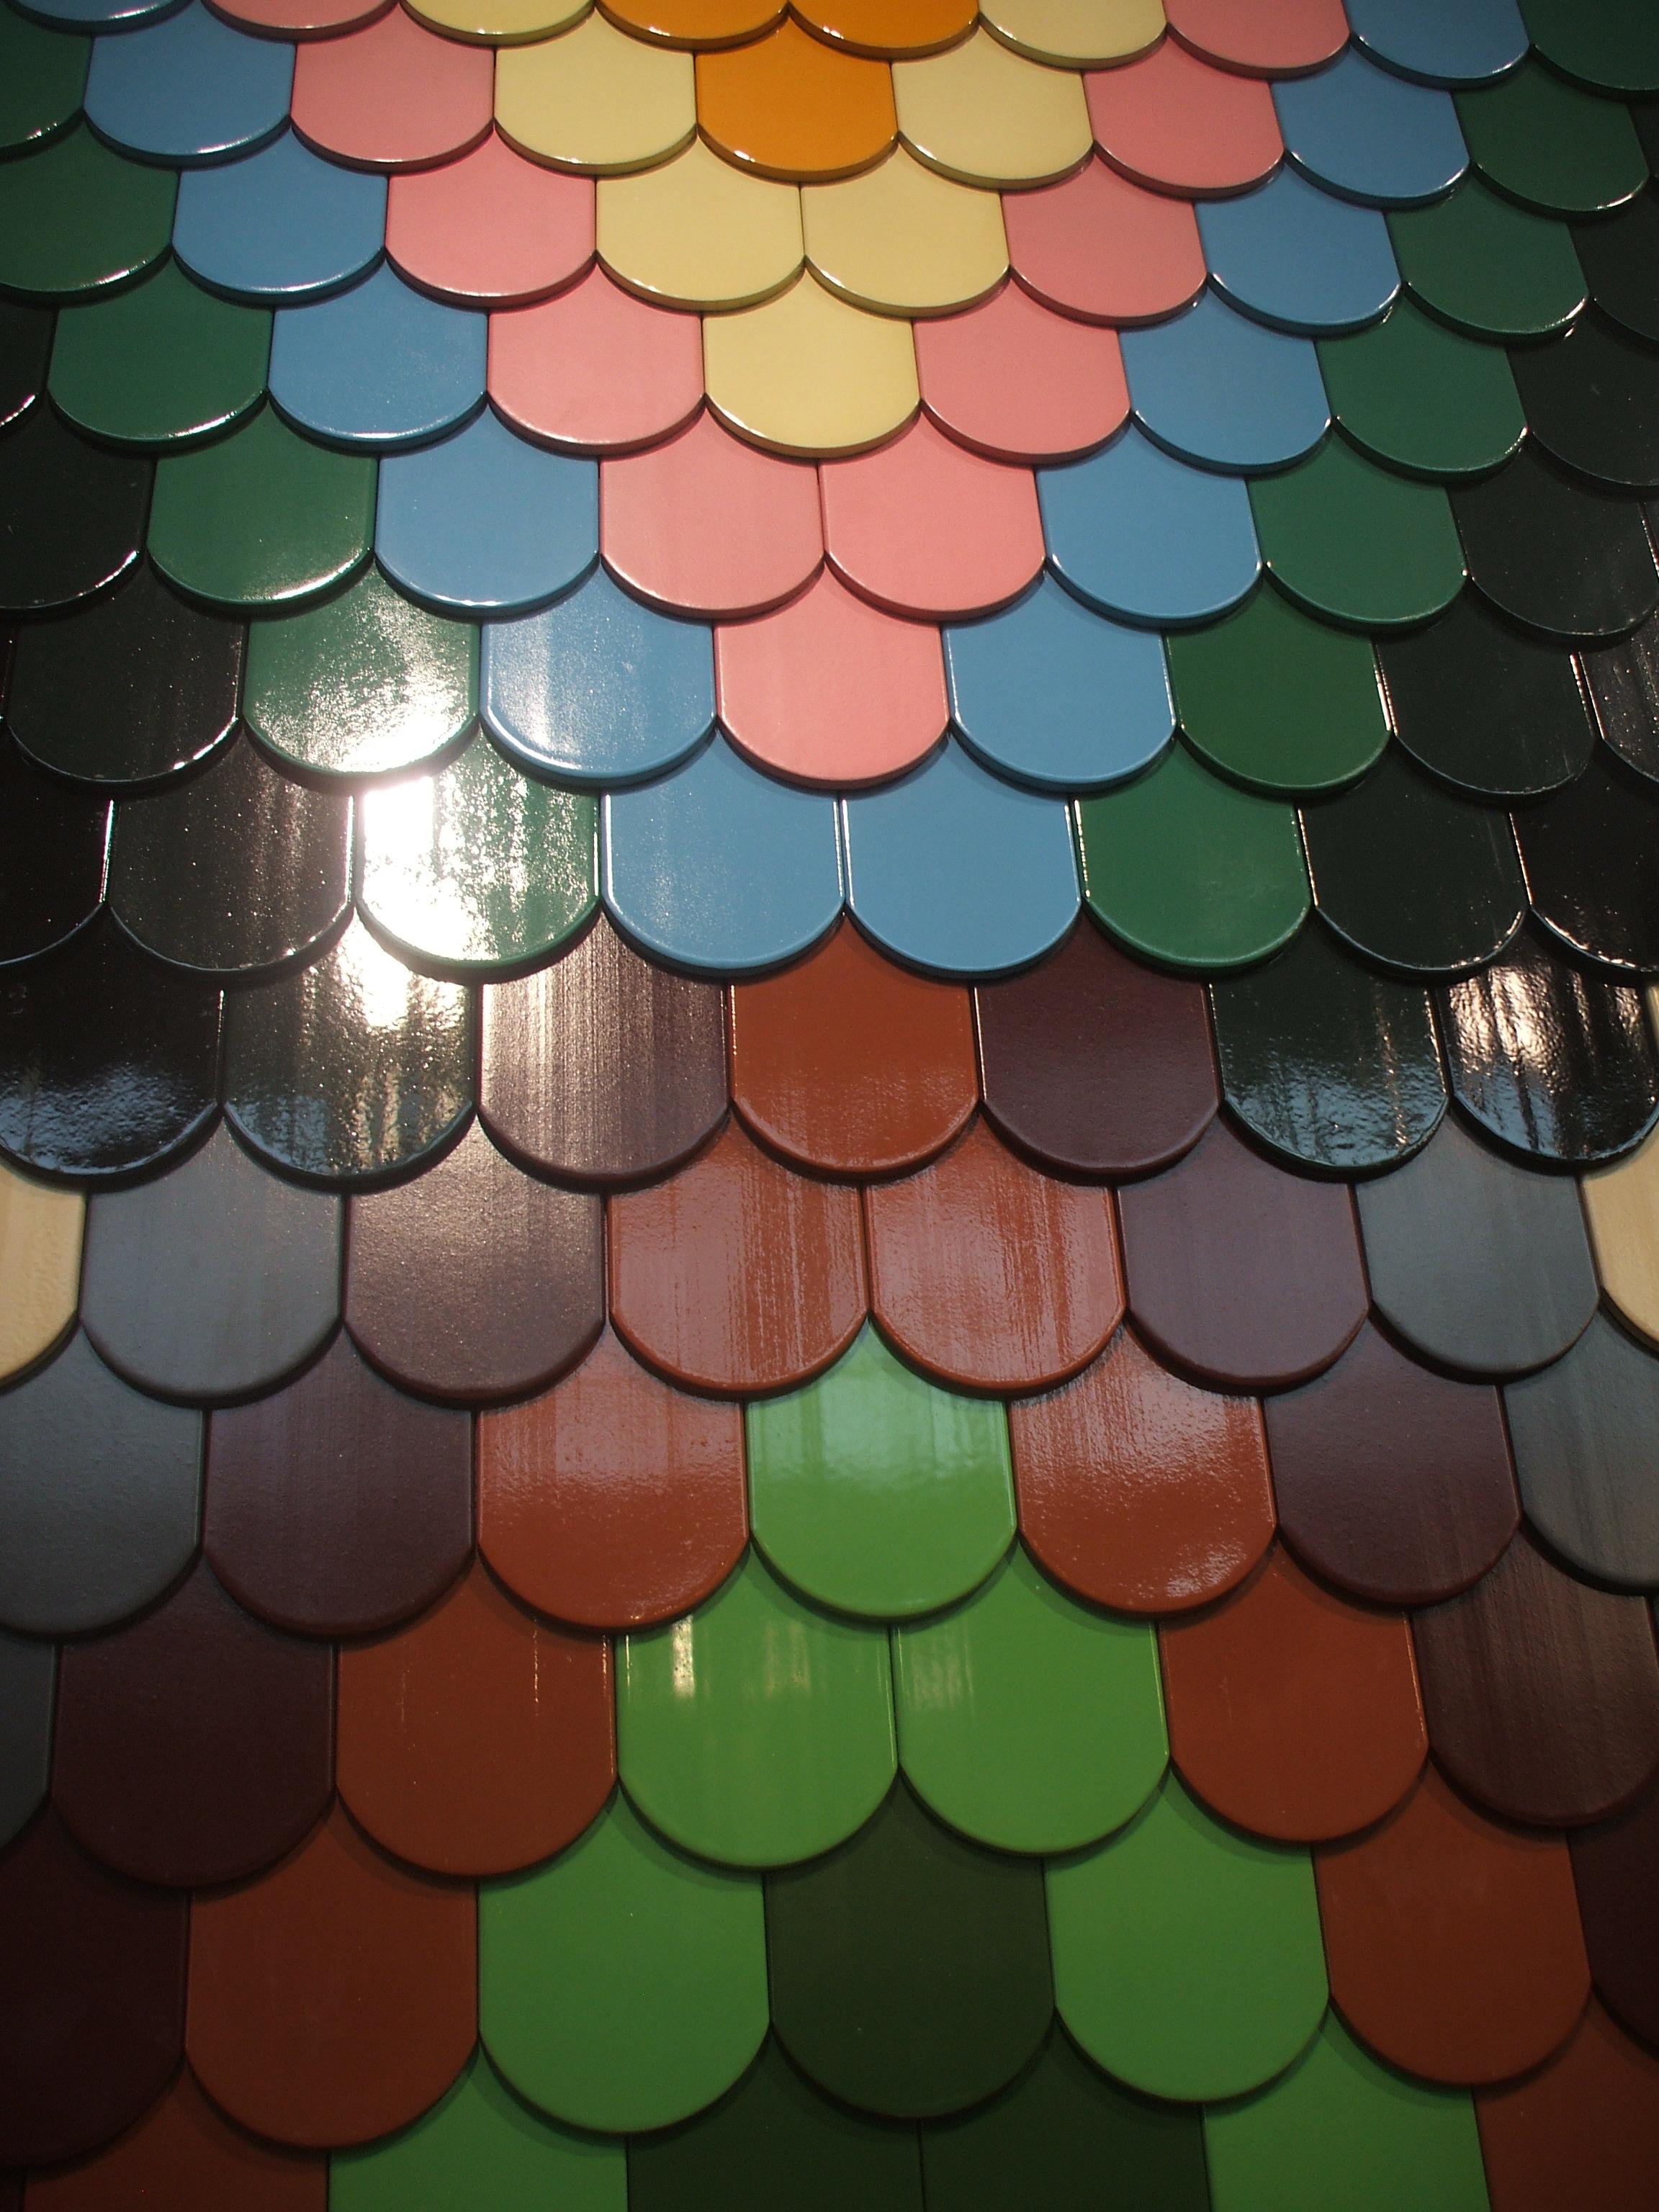 Detaliu - tigla ceramica colorata